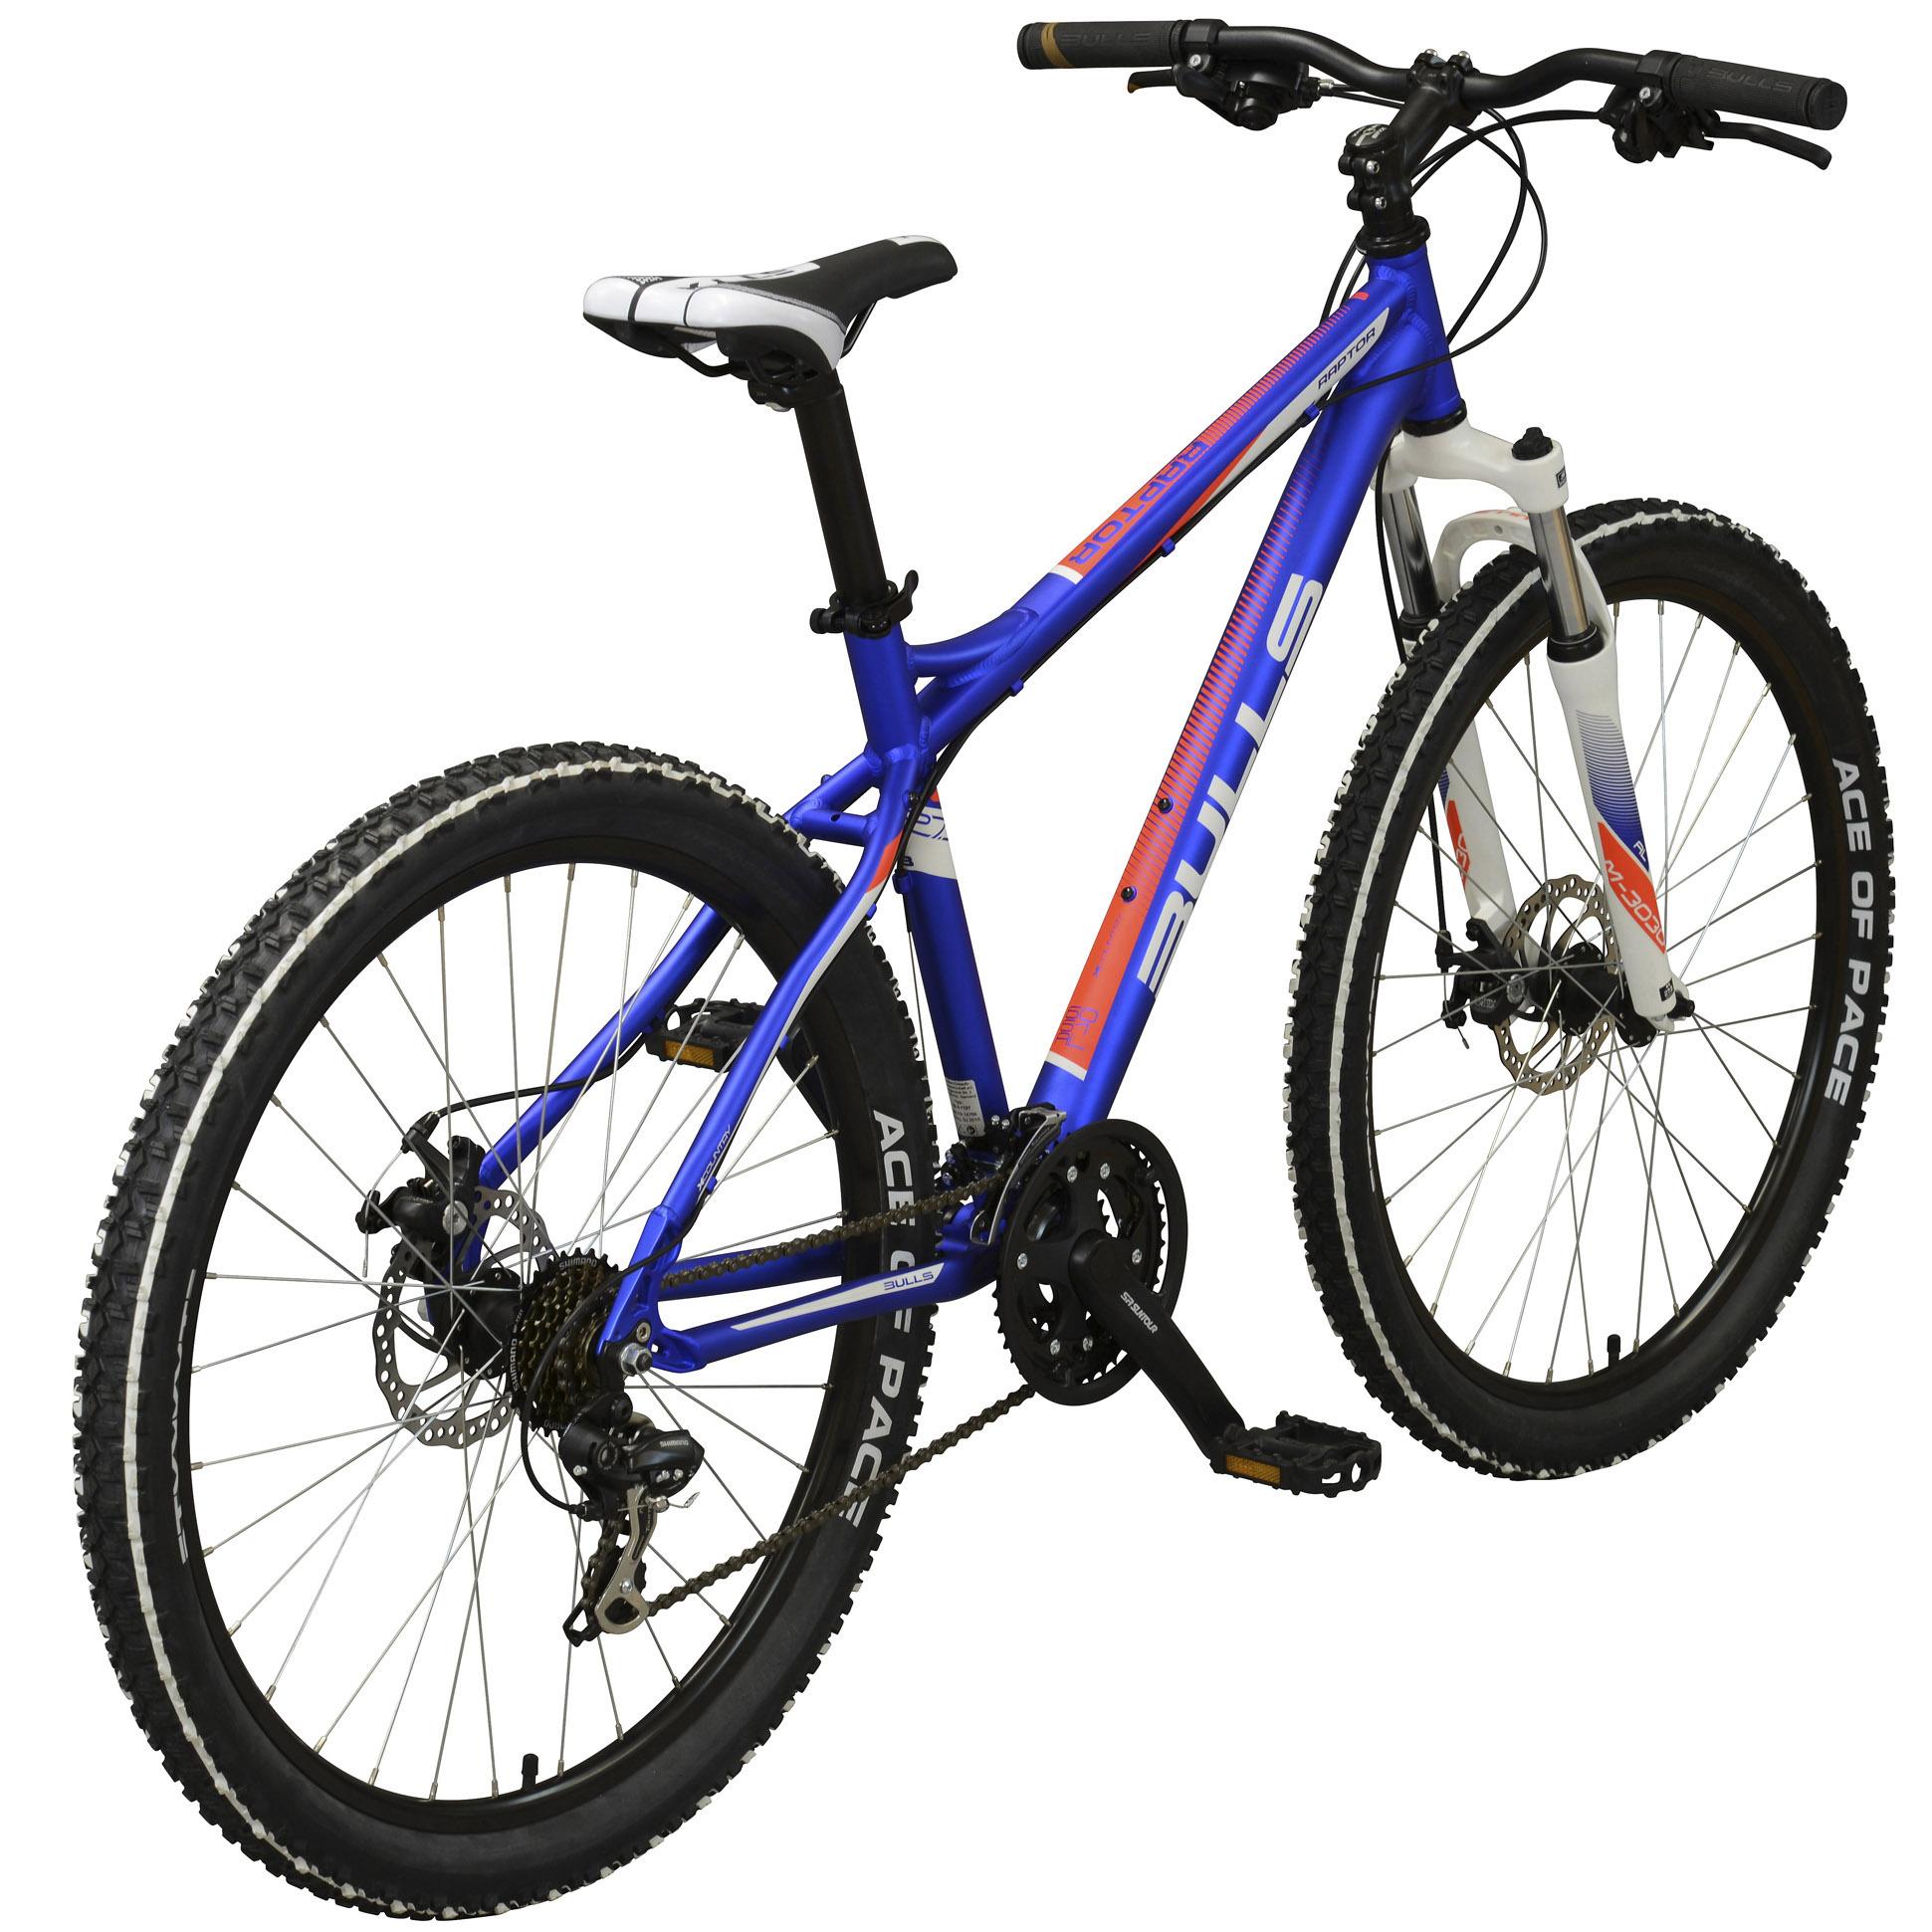 bulls raptor mountainbike 27 5 zoll 37 cm online shop. Black Bedroom Furniture Sets. Home Design Ideas